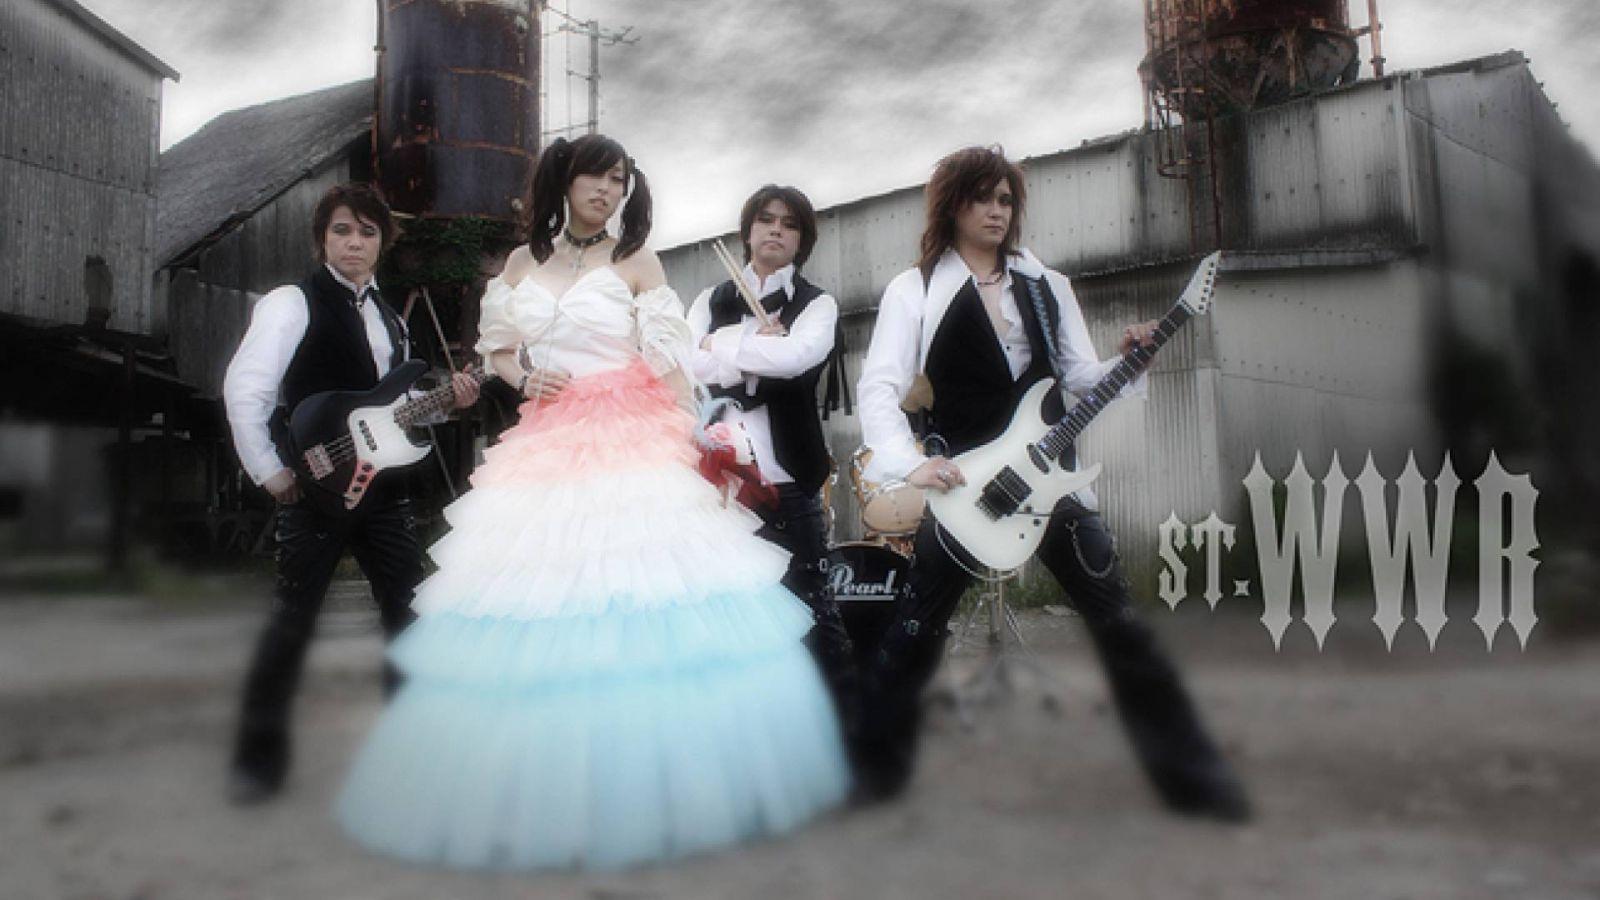 ST.WWR © e-talentbank